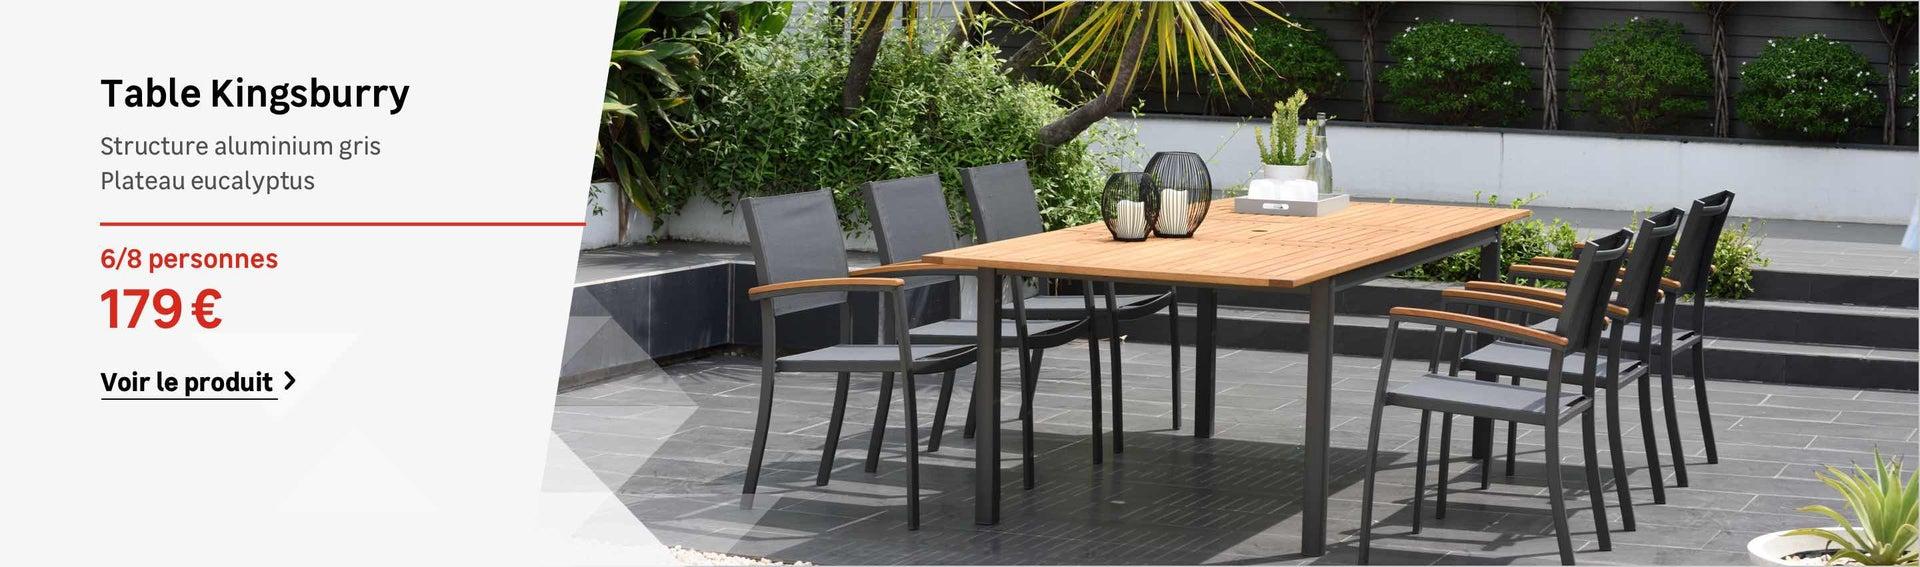 Table Et Chaise De Jardin Aluminium Inspirant Table Et ... tout Salon De Jardin En Aluminium En Solde